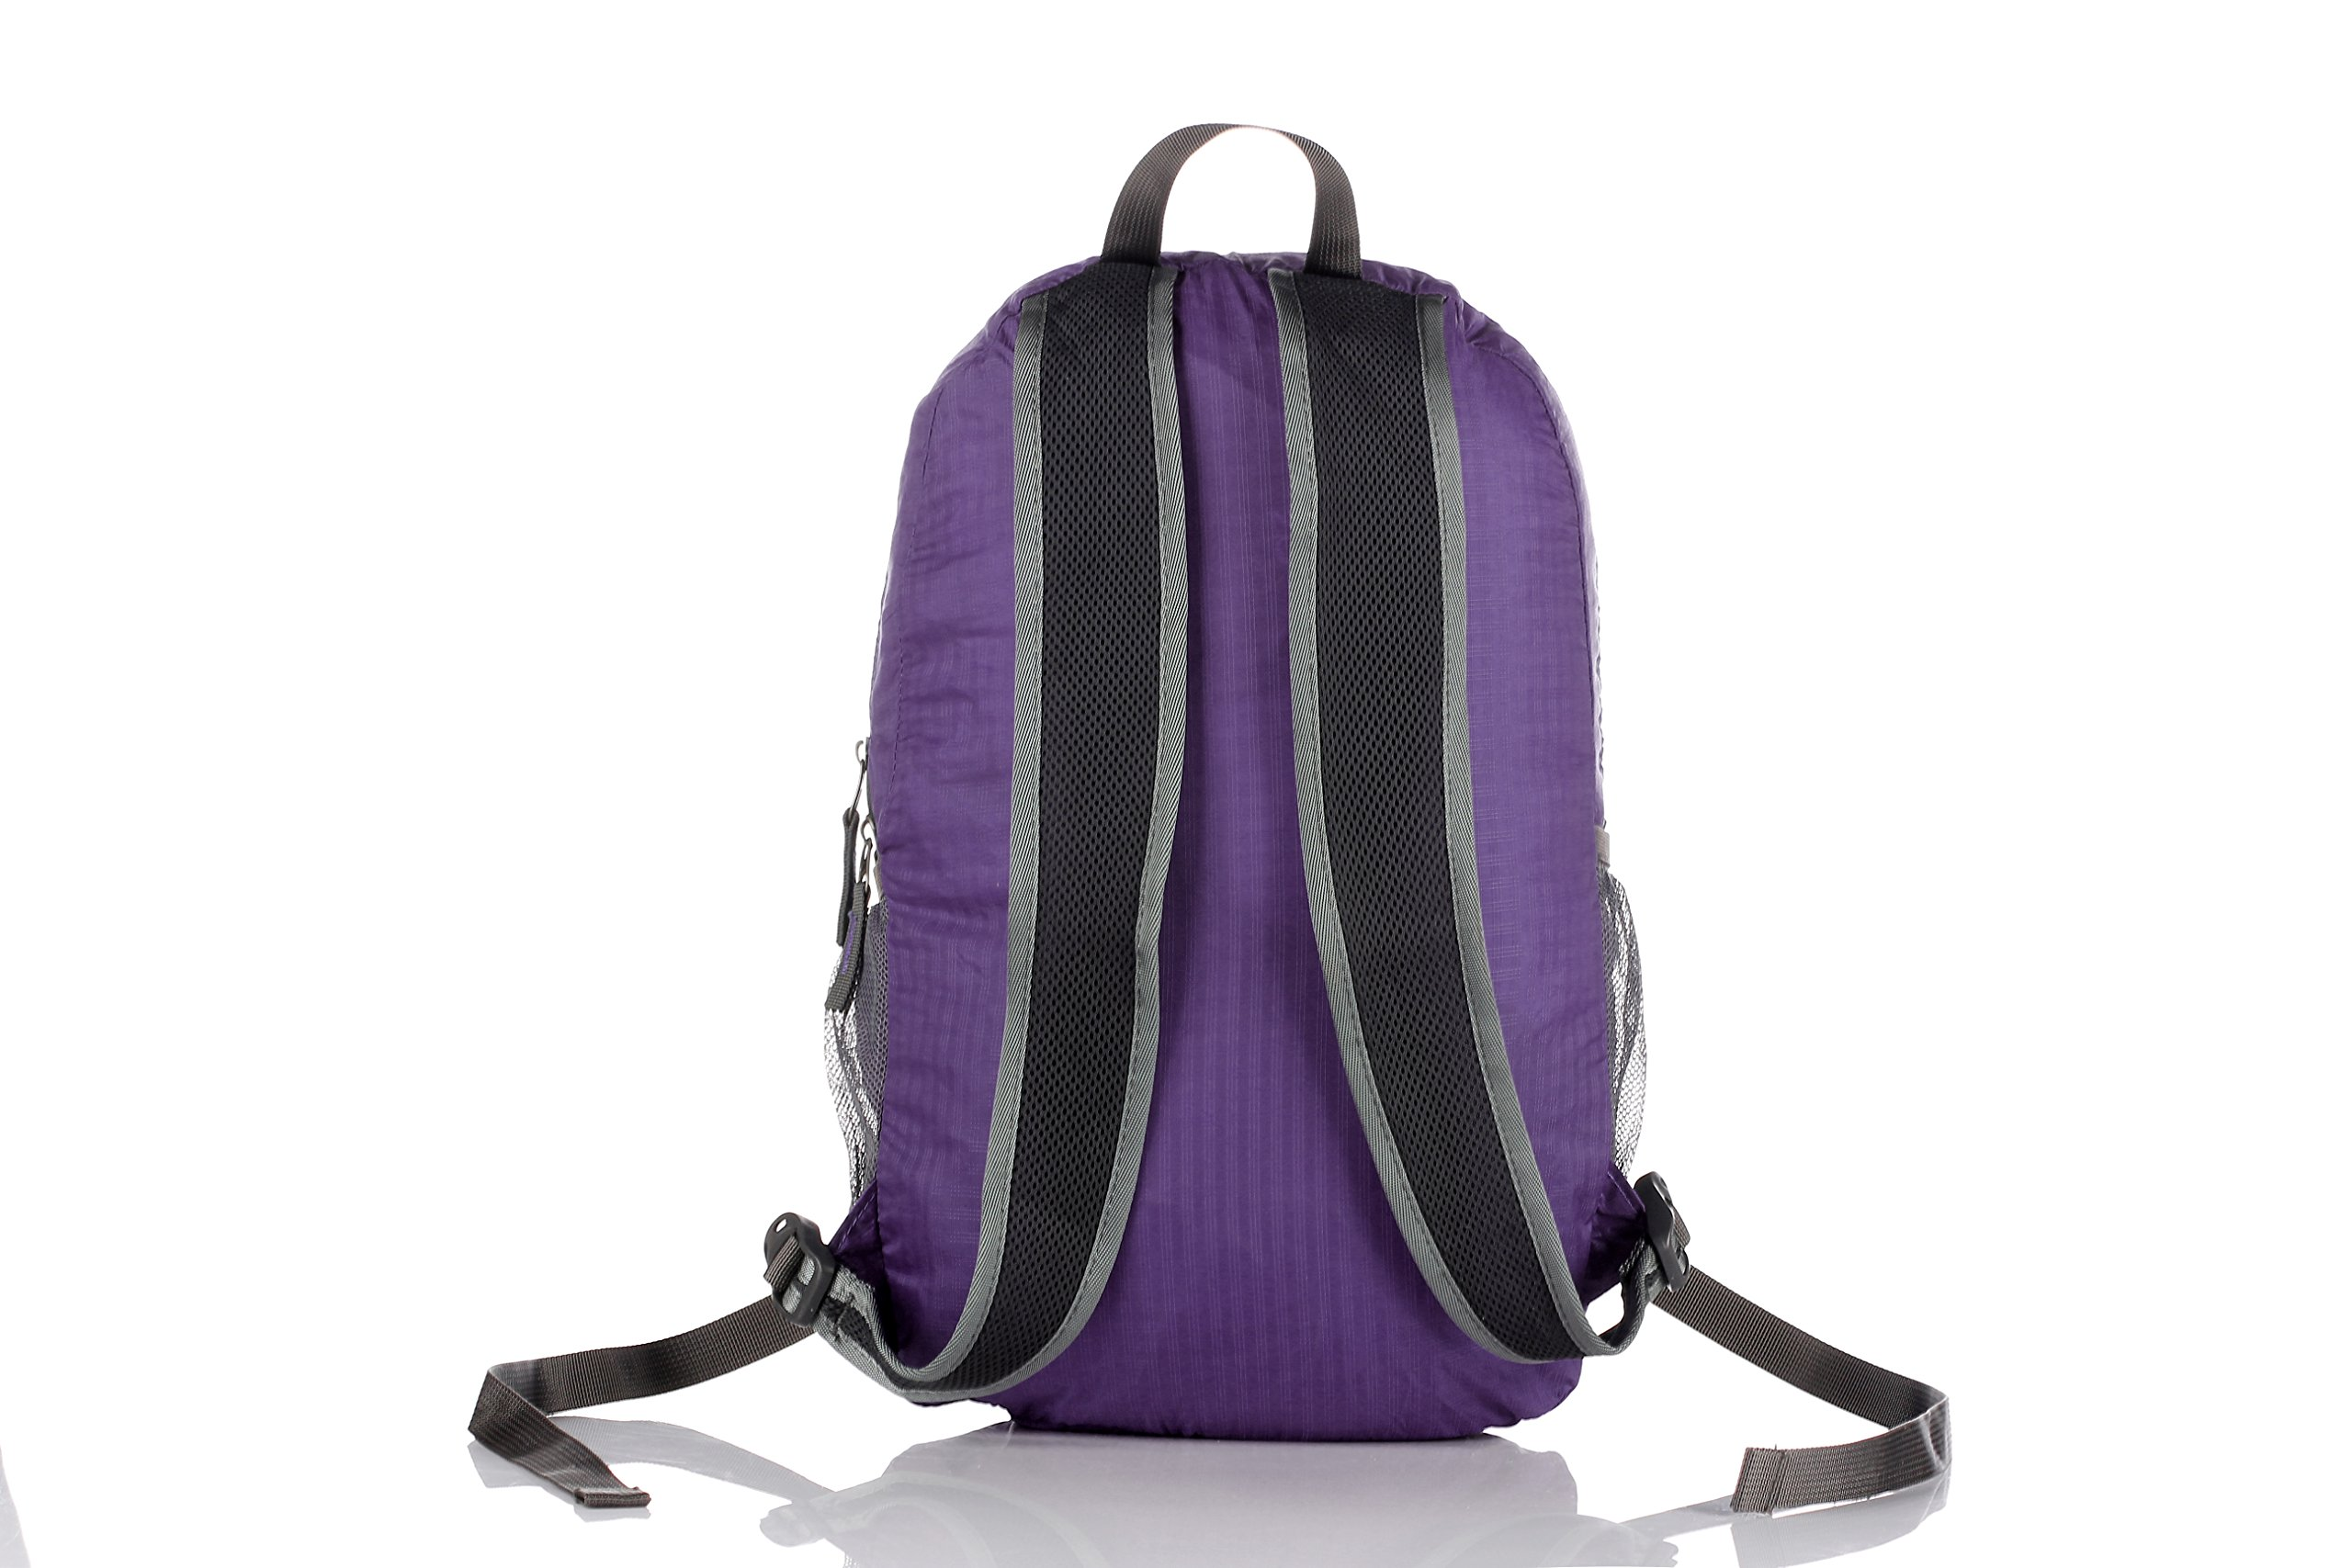 Outlander Packable Handy Lightweight Travel Hiking Backpack Daypack-Purple-L by Outlander (Image #3)